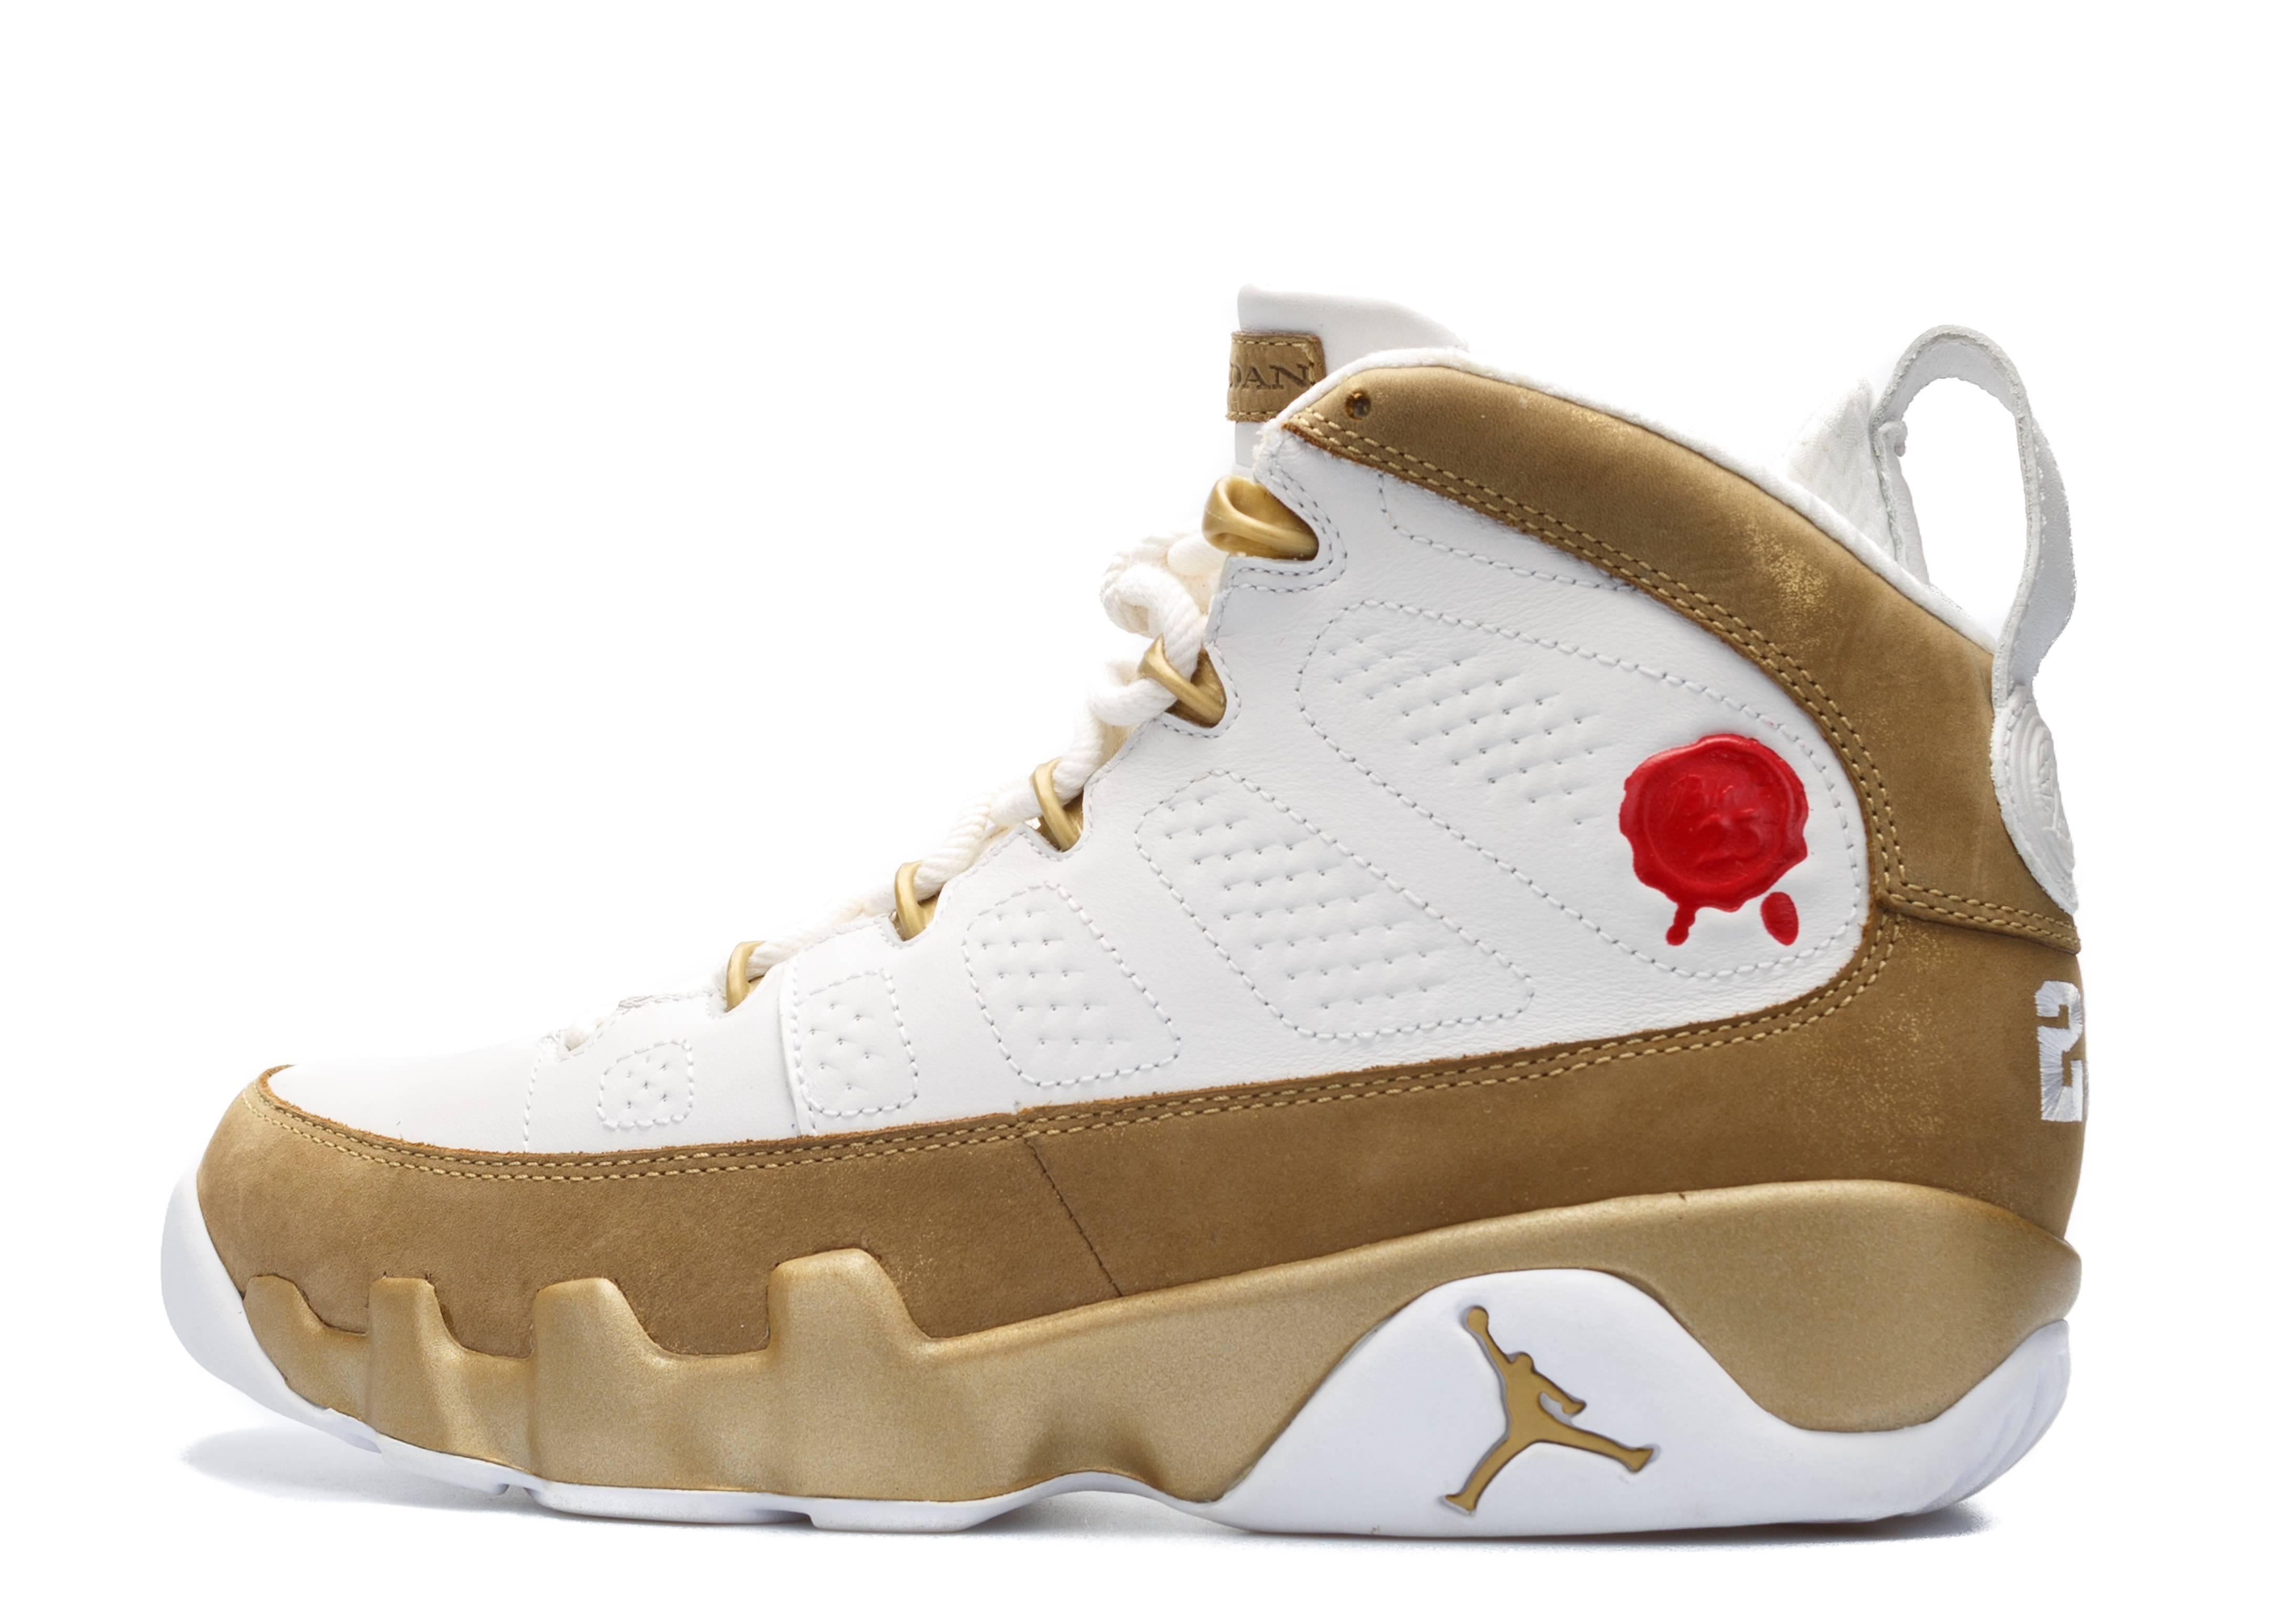 exclusif à vendre acheter escompte obtenir Air Jordan 9 Rétro Premio Collection Bin23 O4uXWqGjhC